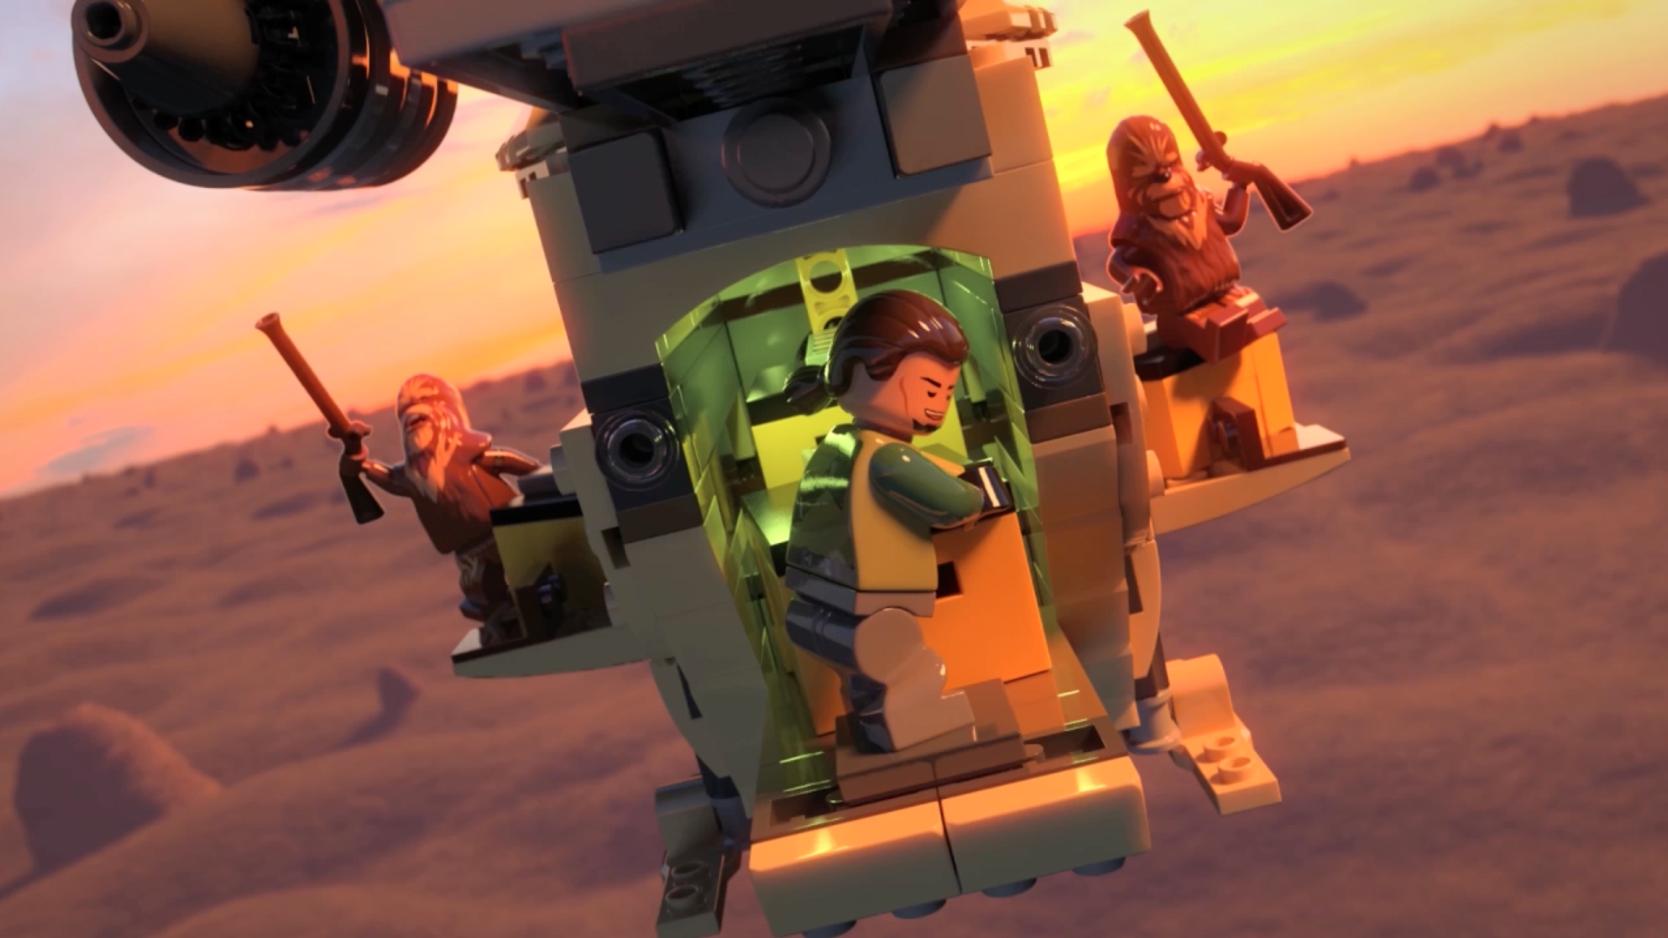 Lego Star Wars – Mini movie 2015 - Episódio 10: Injustiça Rebelde